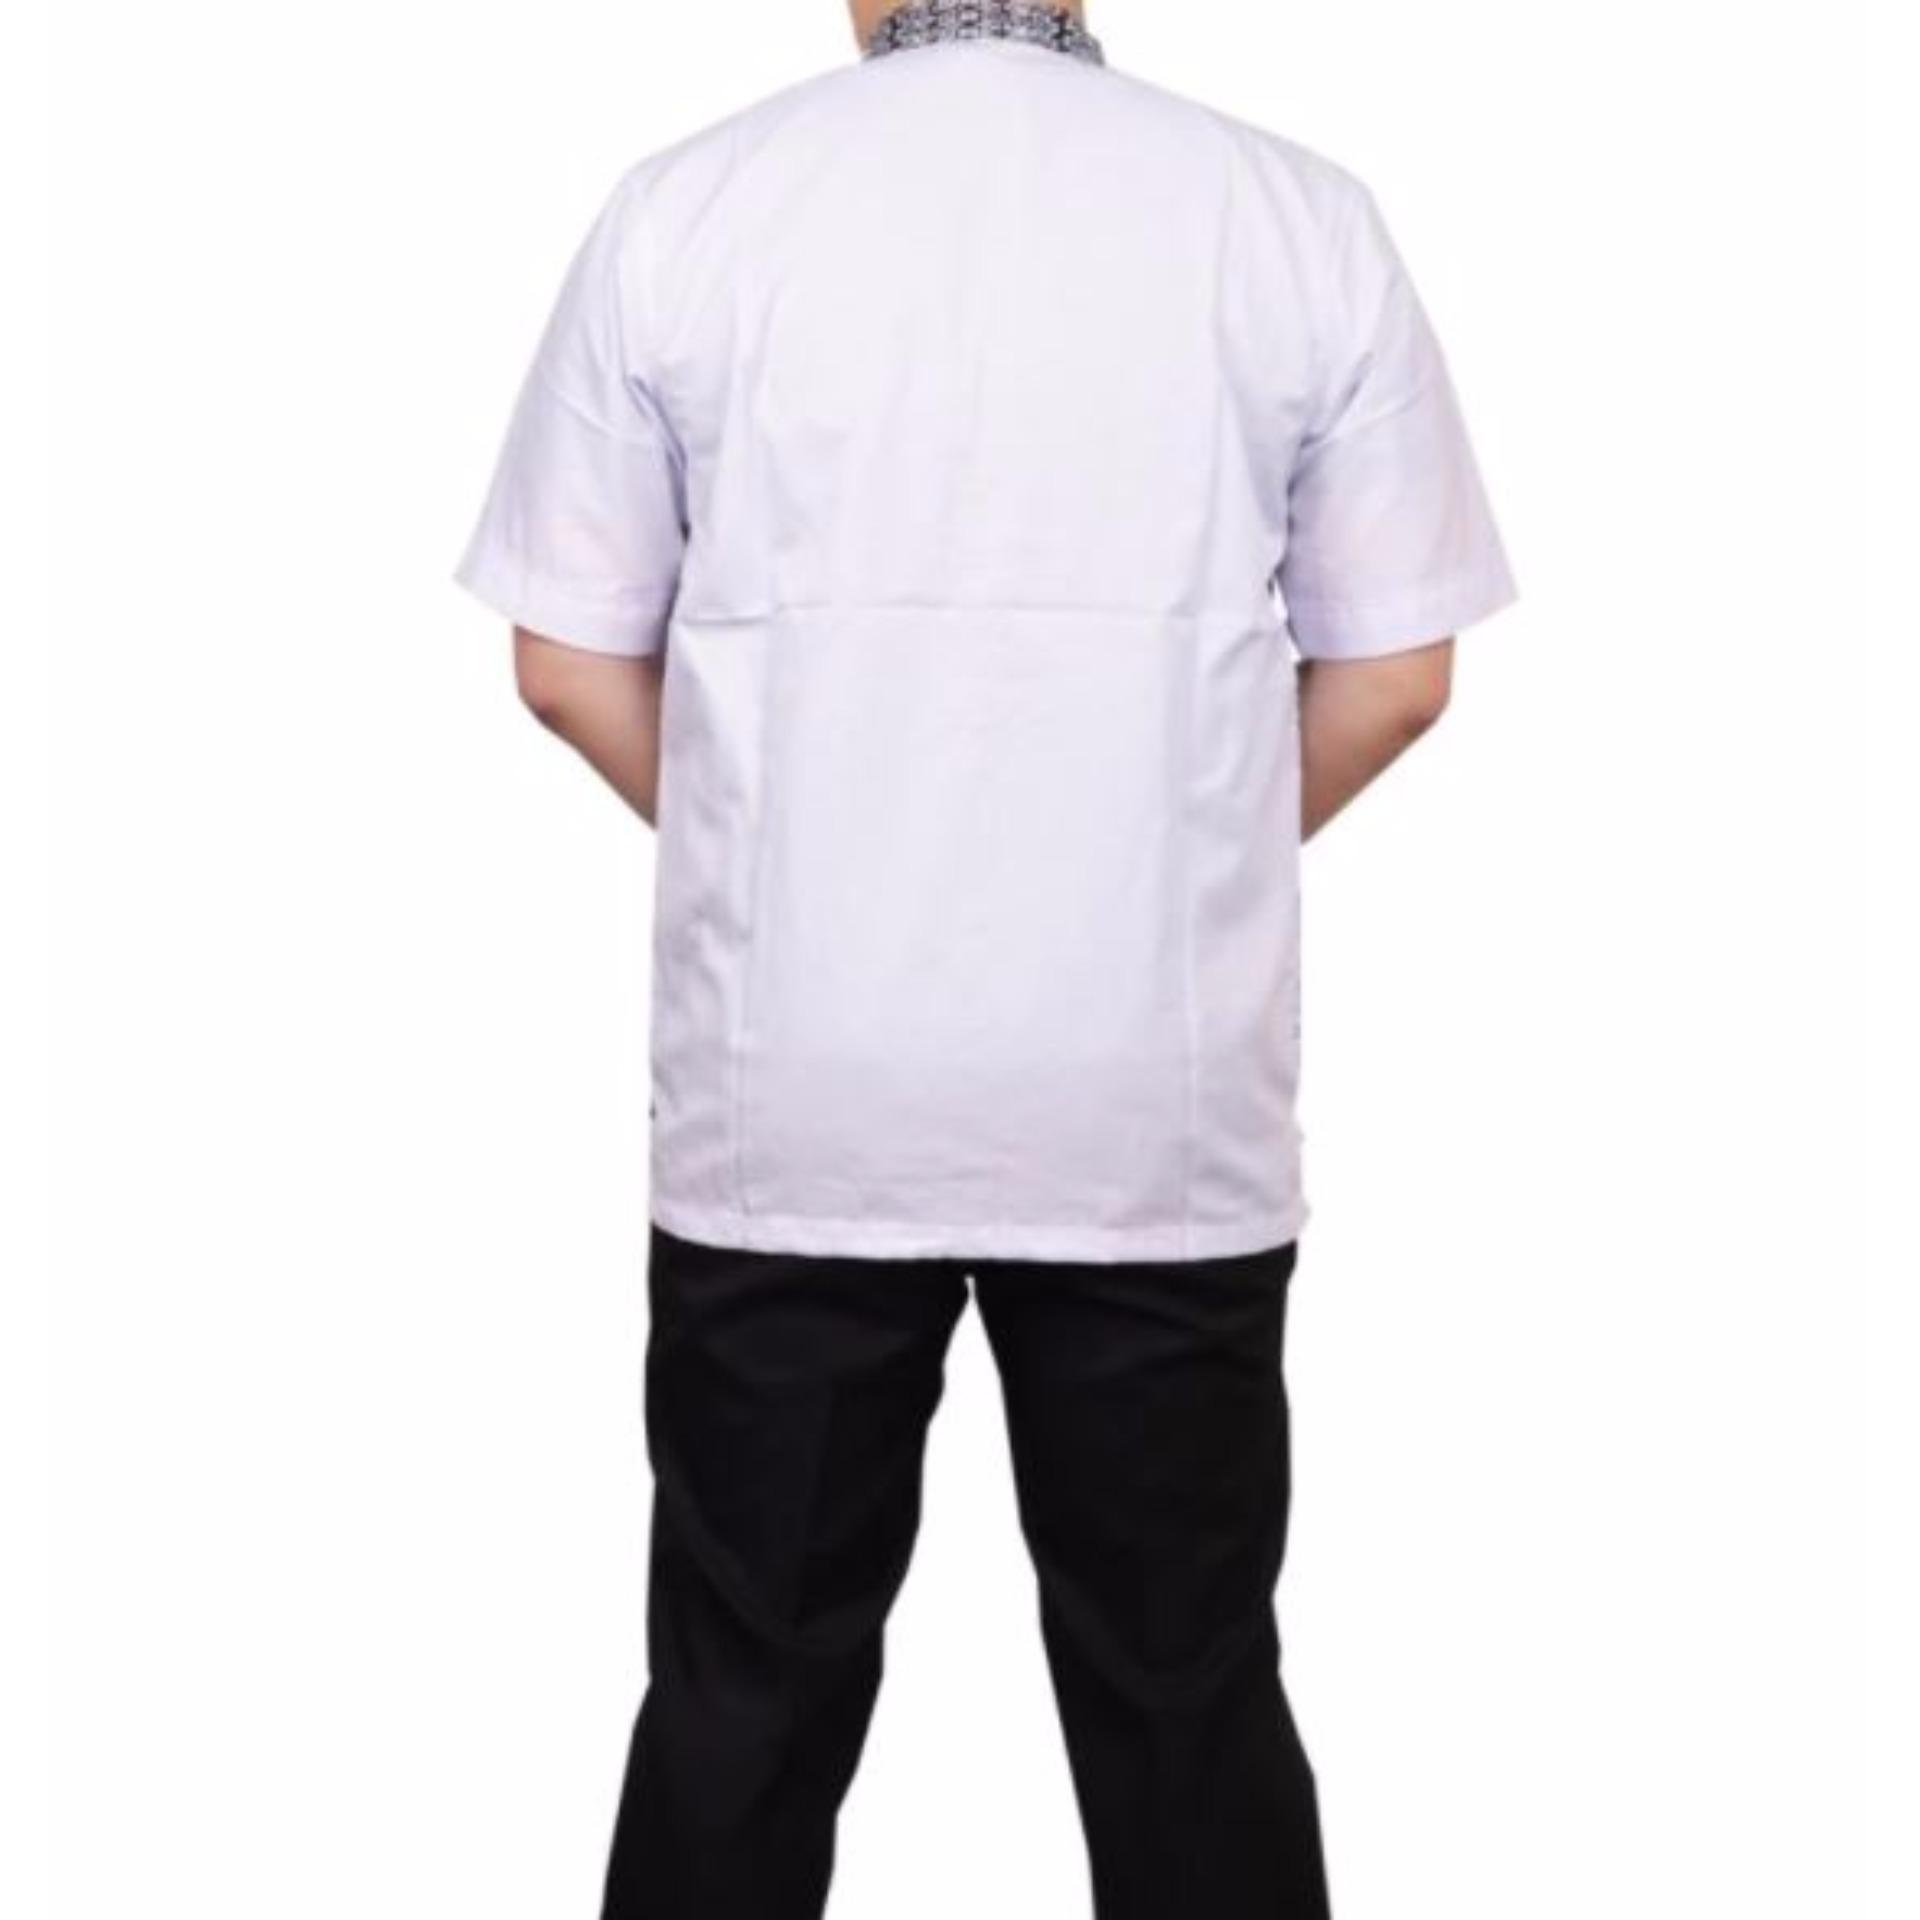 ... Ormano Baju Koko Muslim Batik Lengan Panjang Lebaran Hari Raya Pengajian ZO17 KK91 Kemeja Fashion Pria